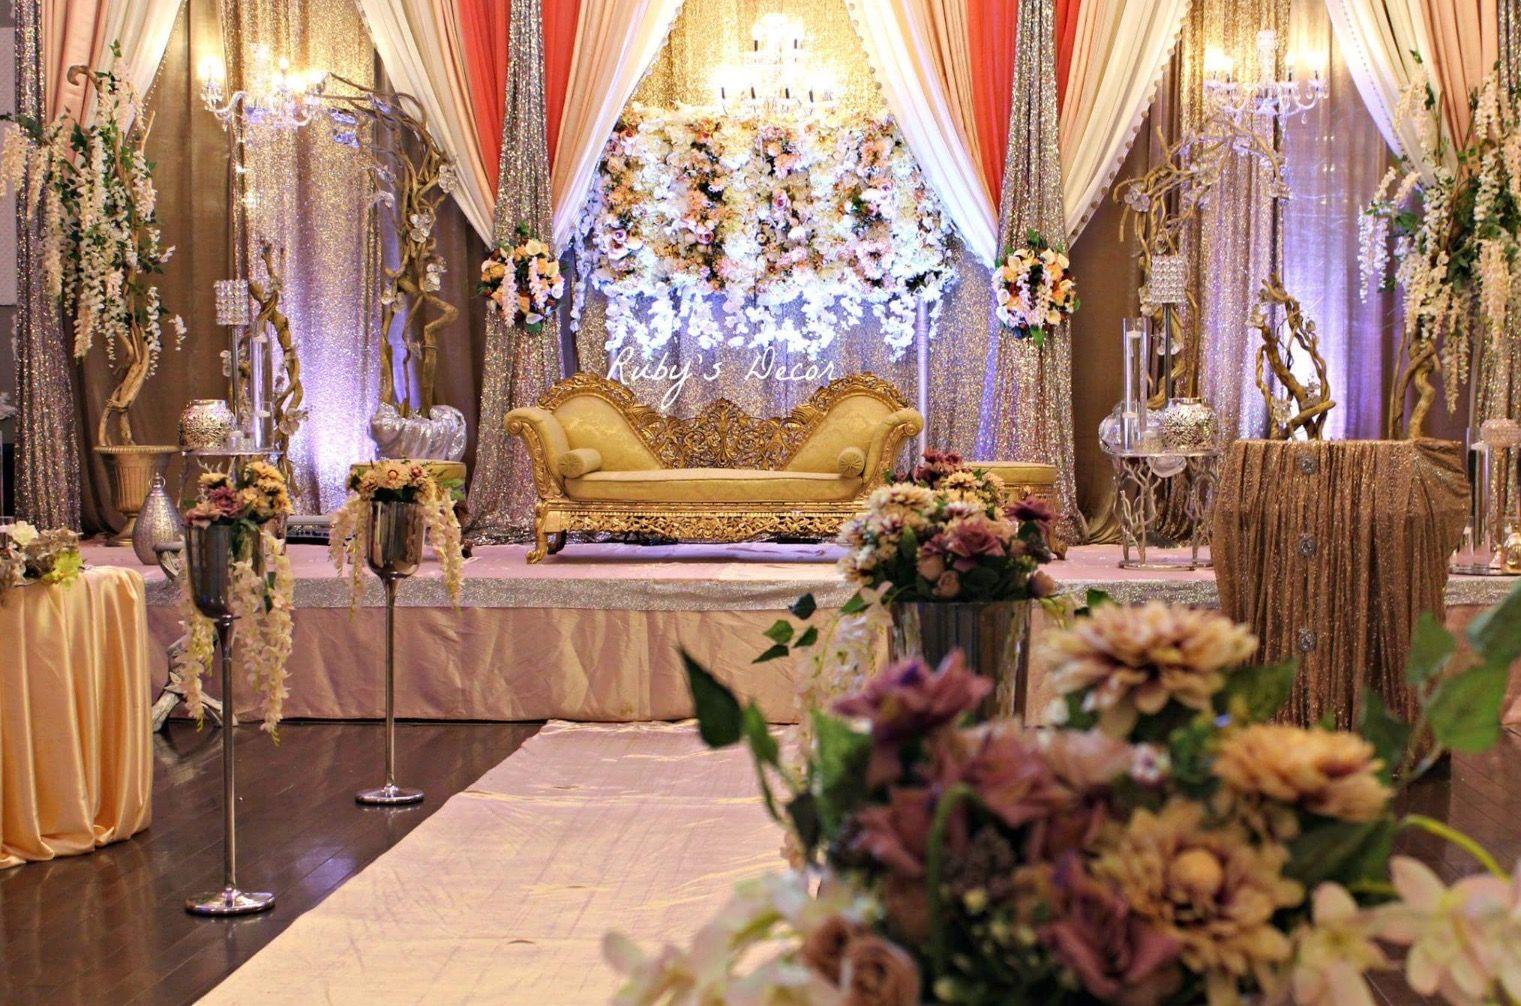 Wedding stage decor, Indian/Pakistani weddings, beautiful stages, rubydecortoronto